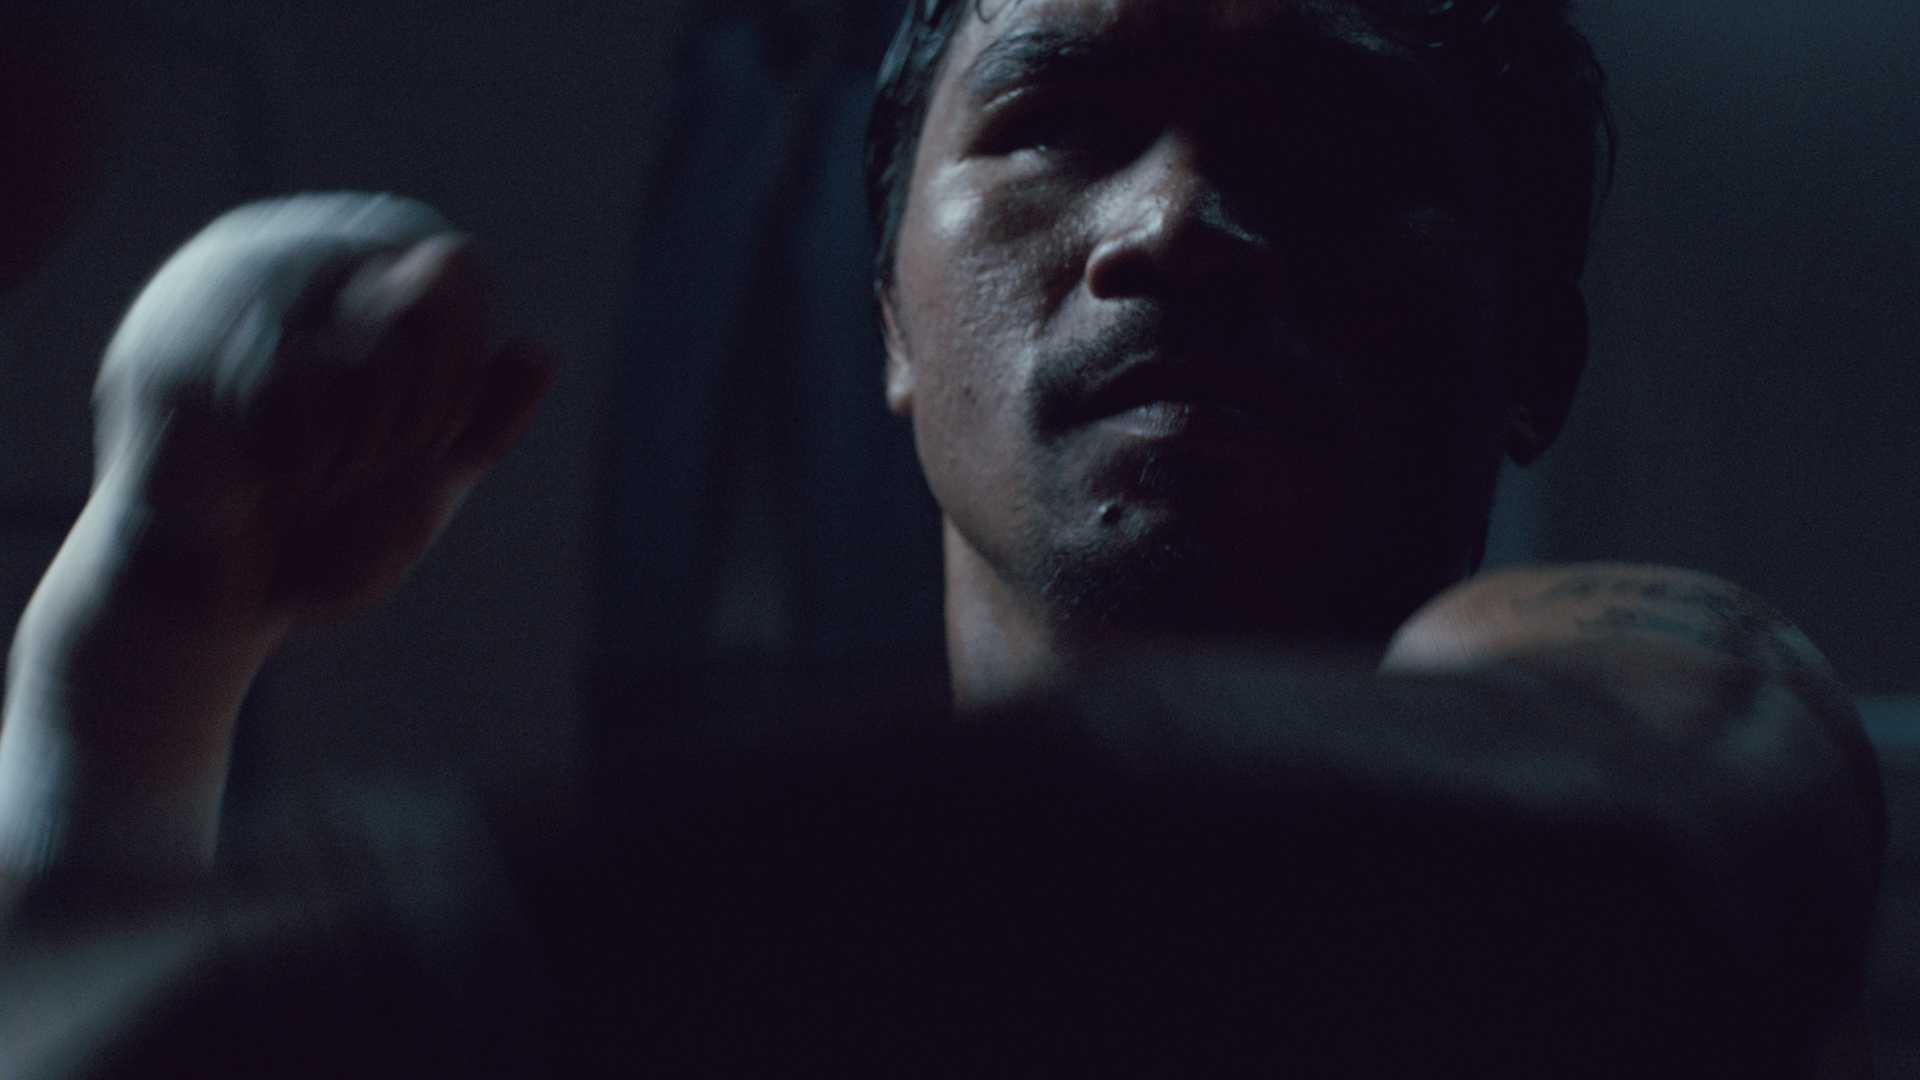 Hennessy, Martin Scorsese, Manny Pacquiao & Erykah Badu Inspire Fans, Push Limits [VIDEO]